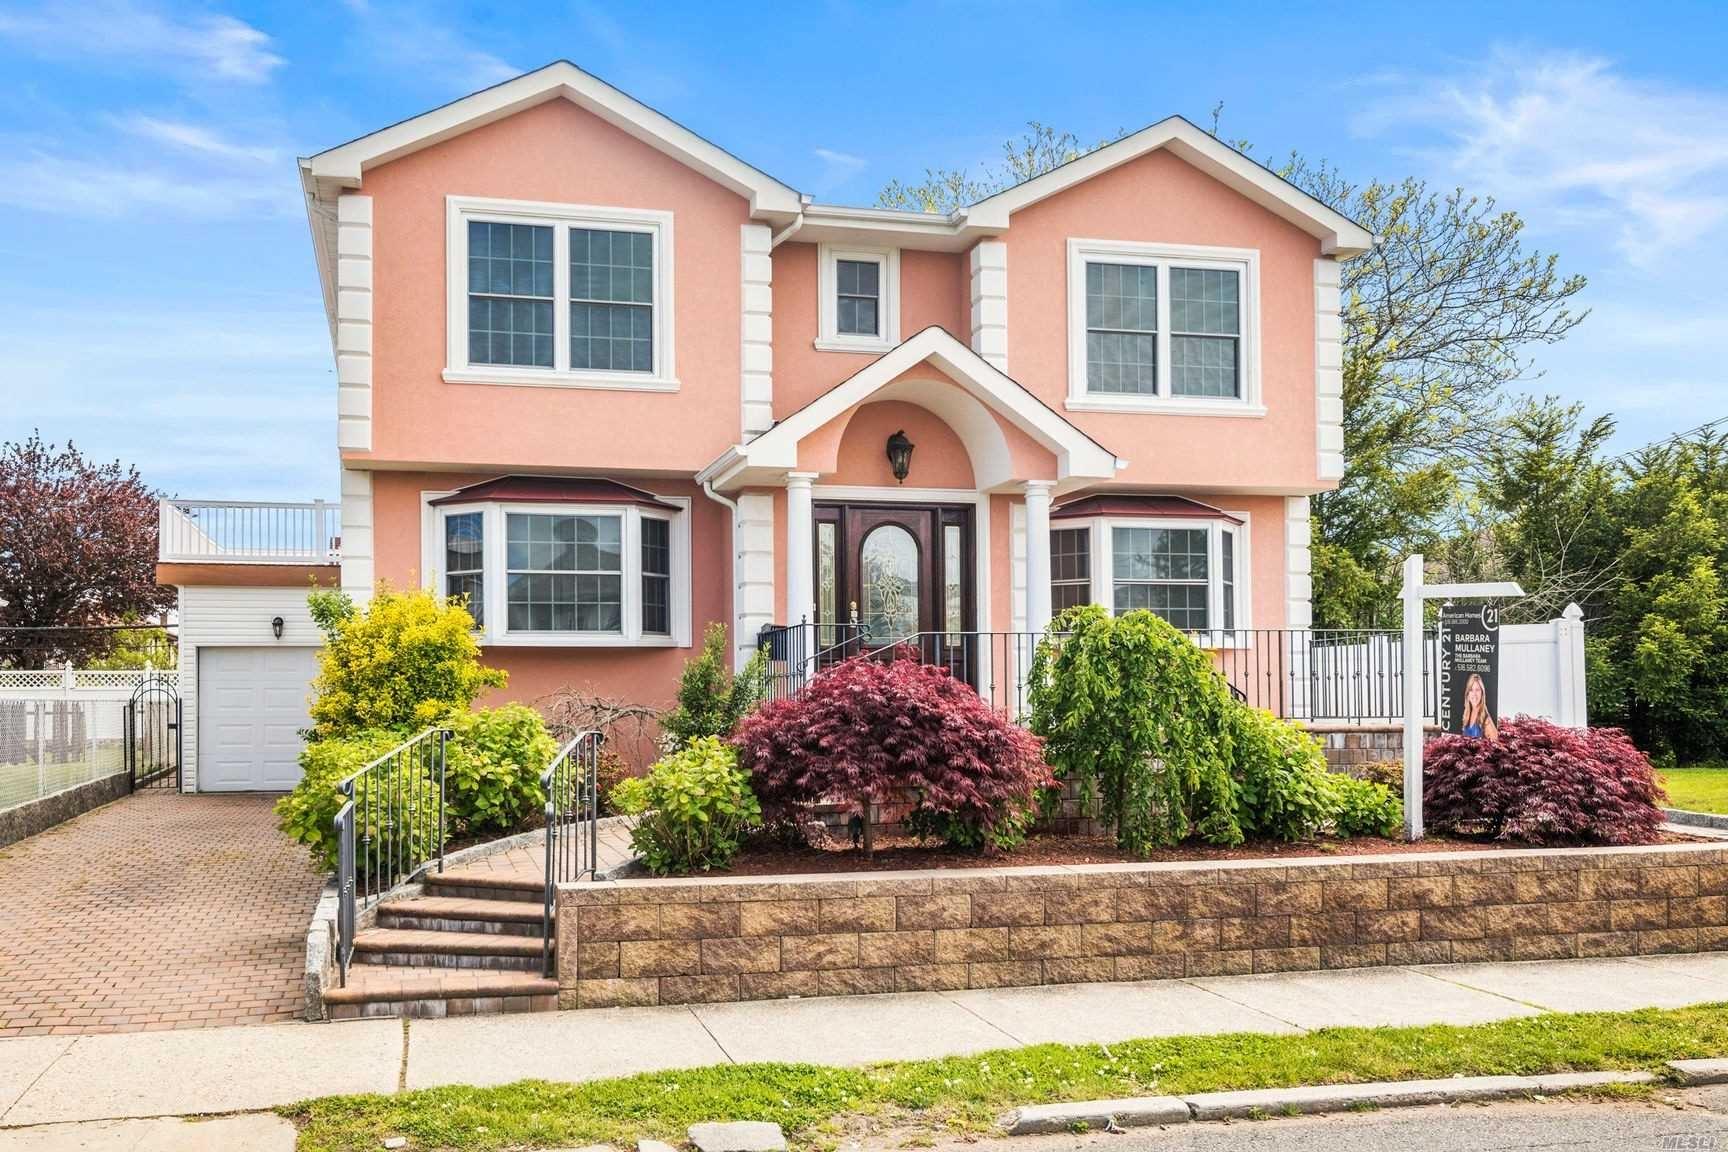 168 W Hudson Street, Long Beach, NY 11561 - MLS#: 3218195